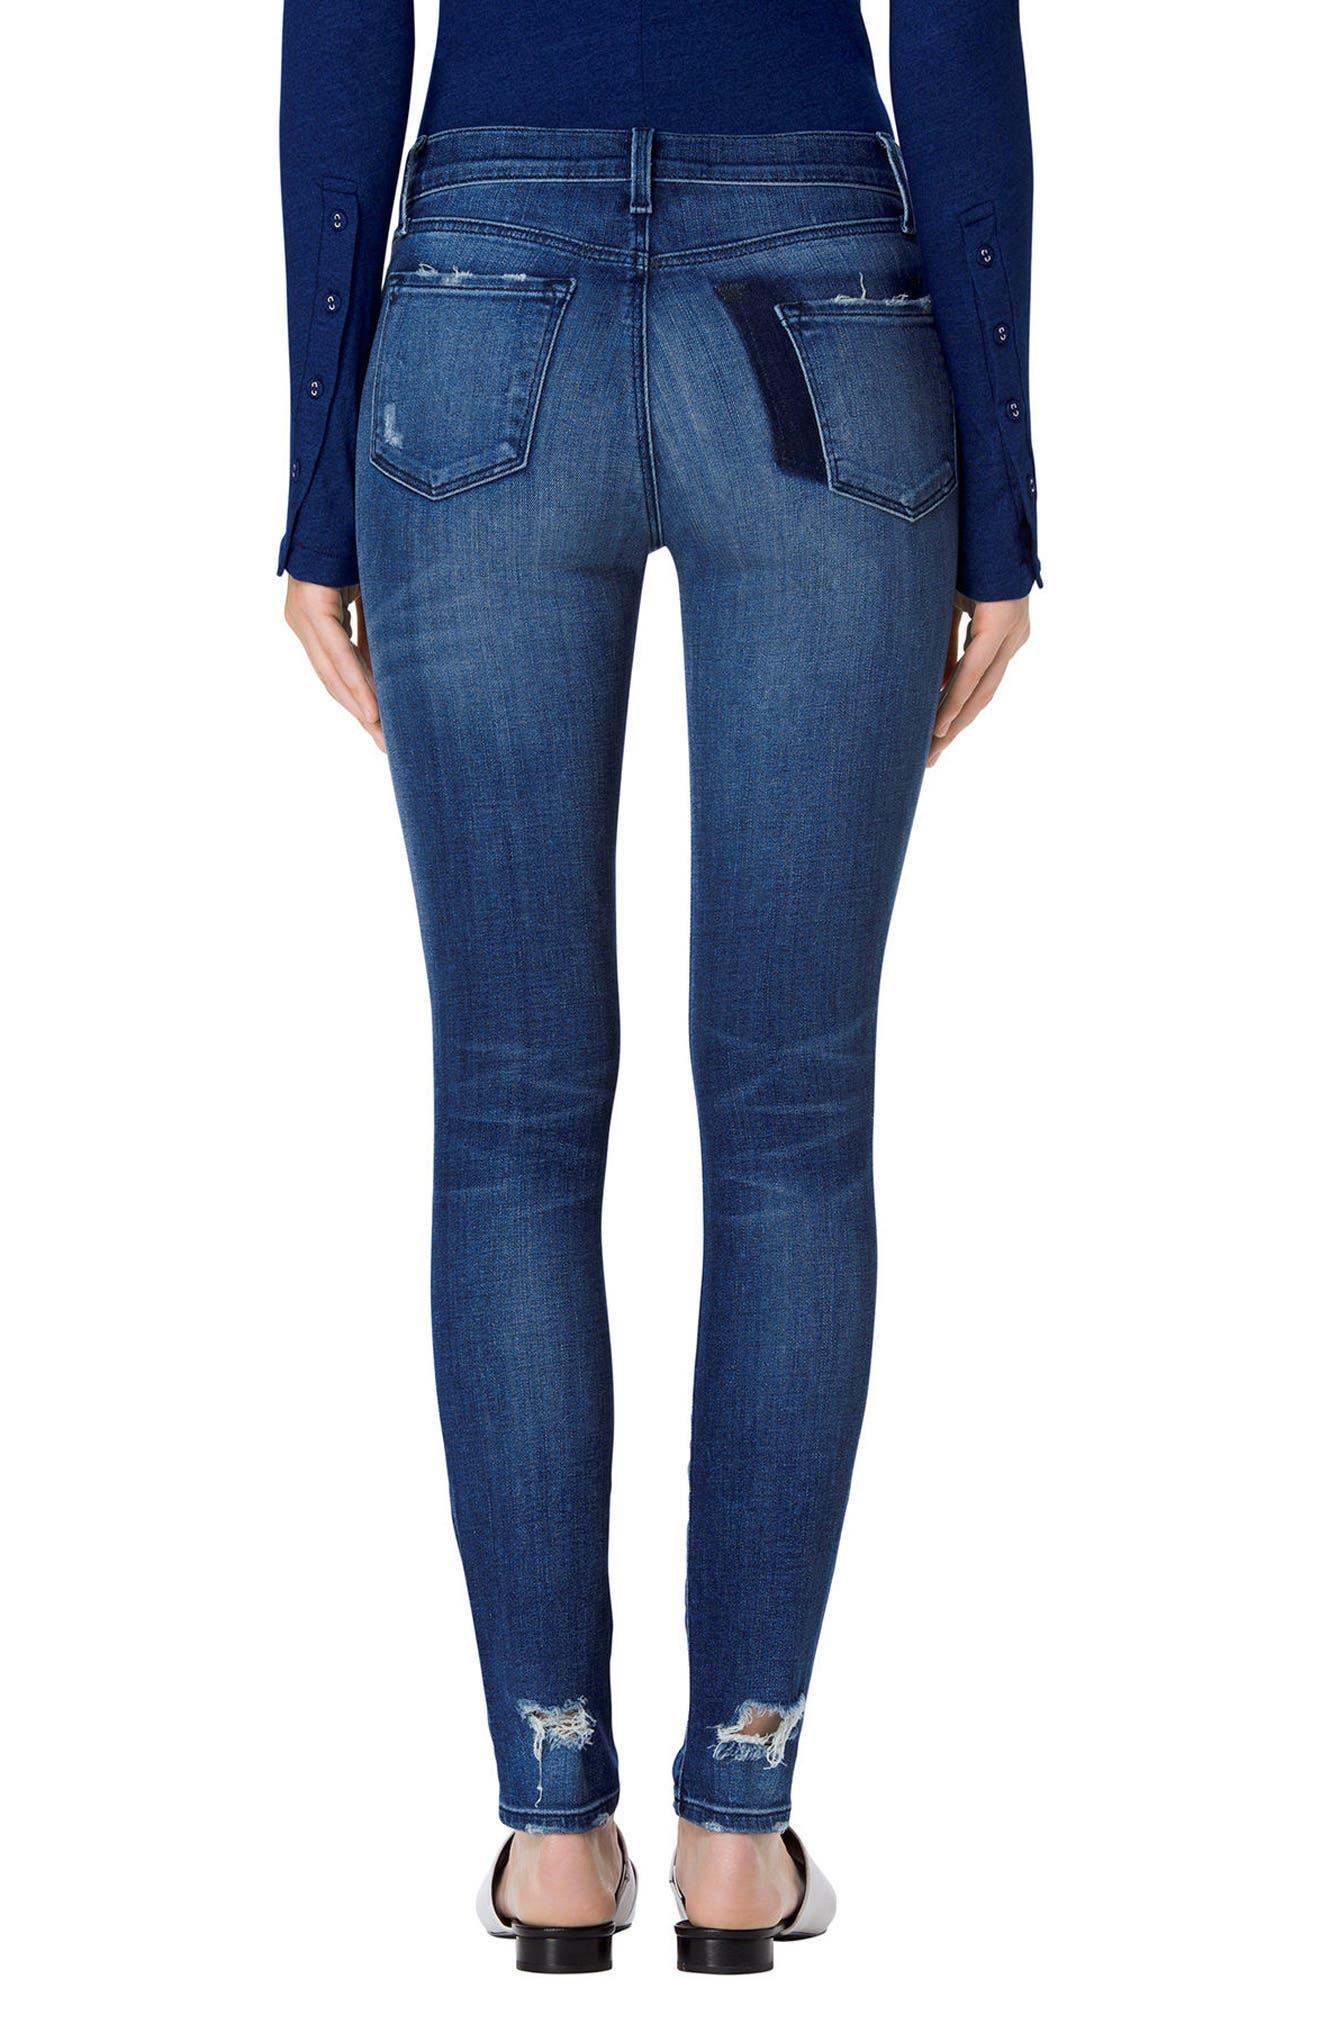 620 Skinny Jeans,                             Alternate thumbnail 2, color,                             470